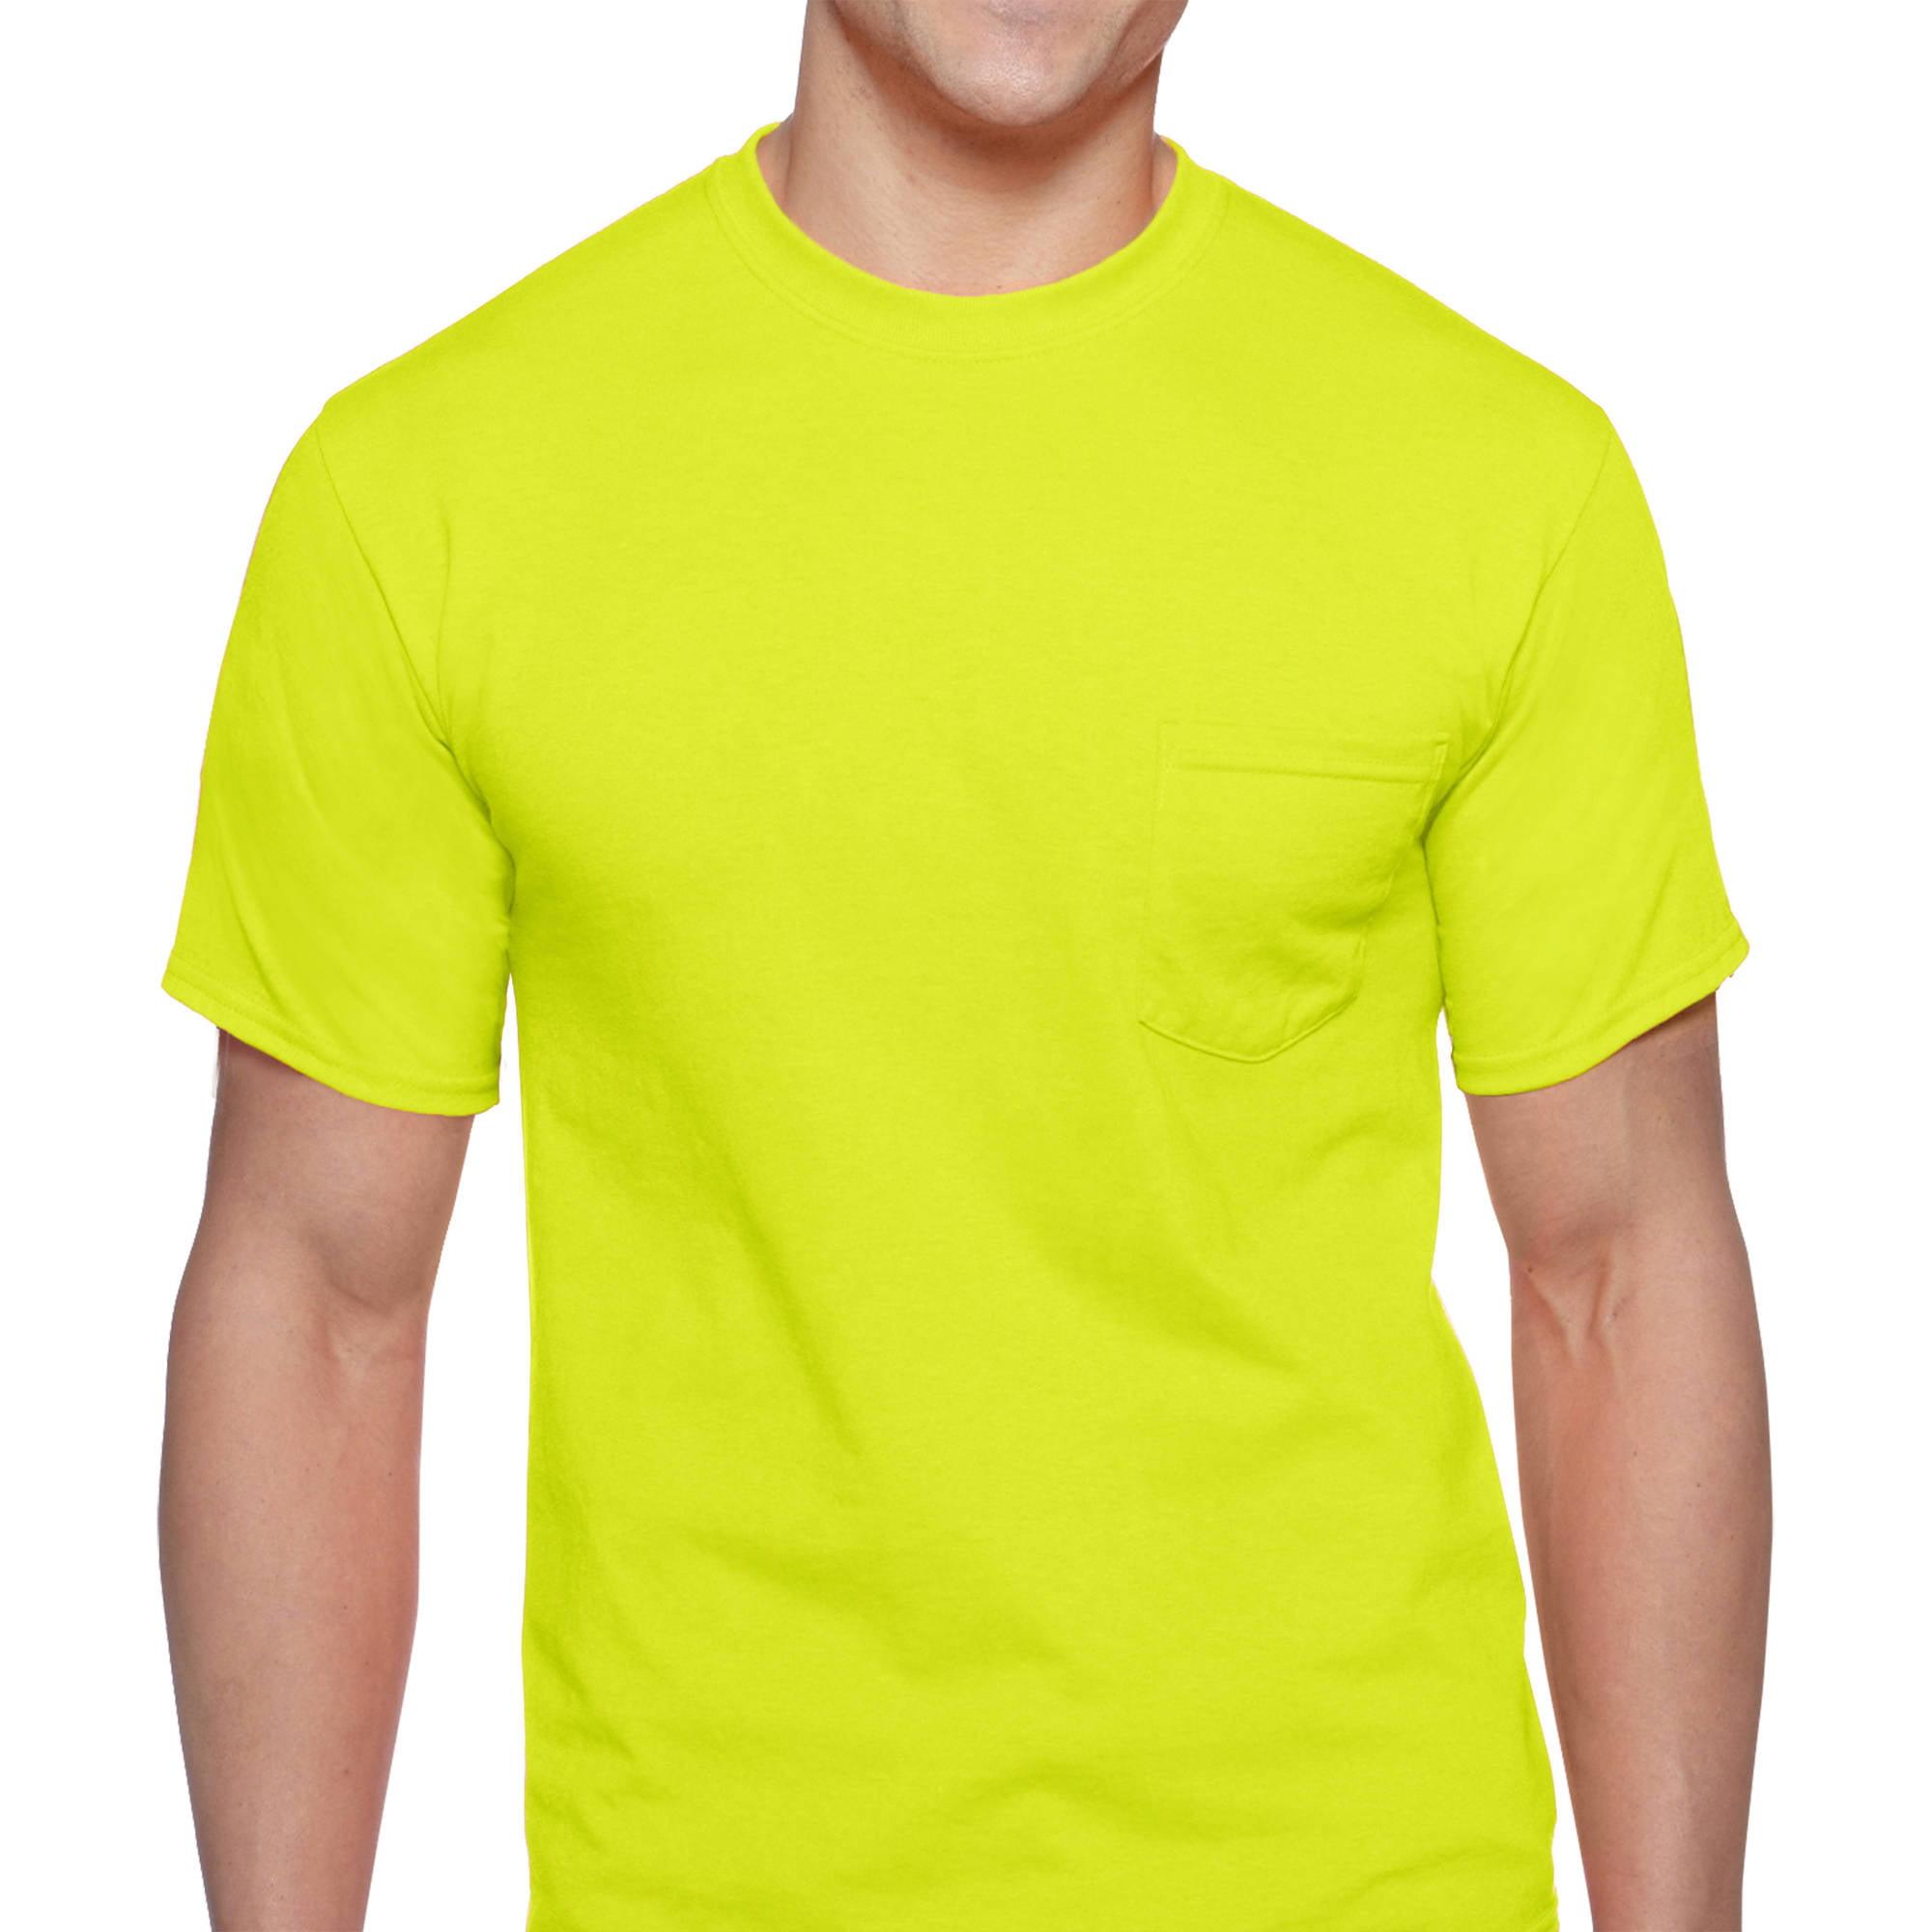 Gildan Men's Workwear Short Sleeve High Visibility Crew, 2-Pack